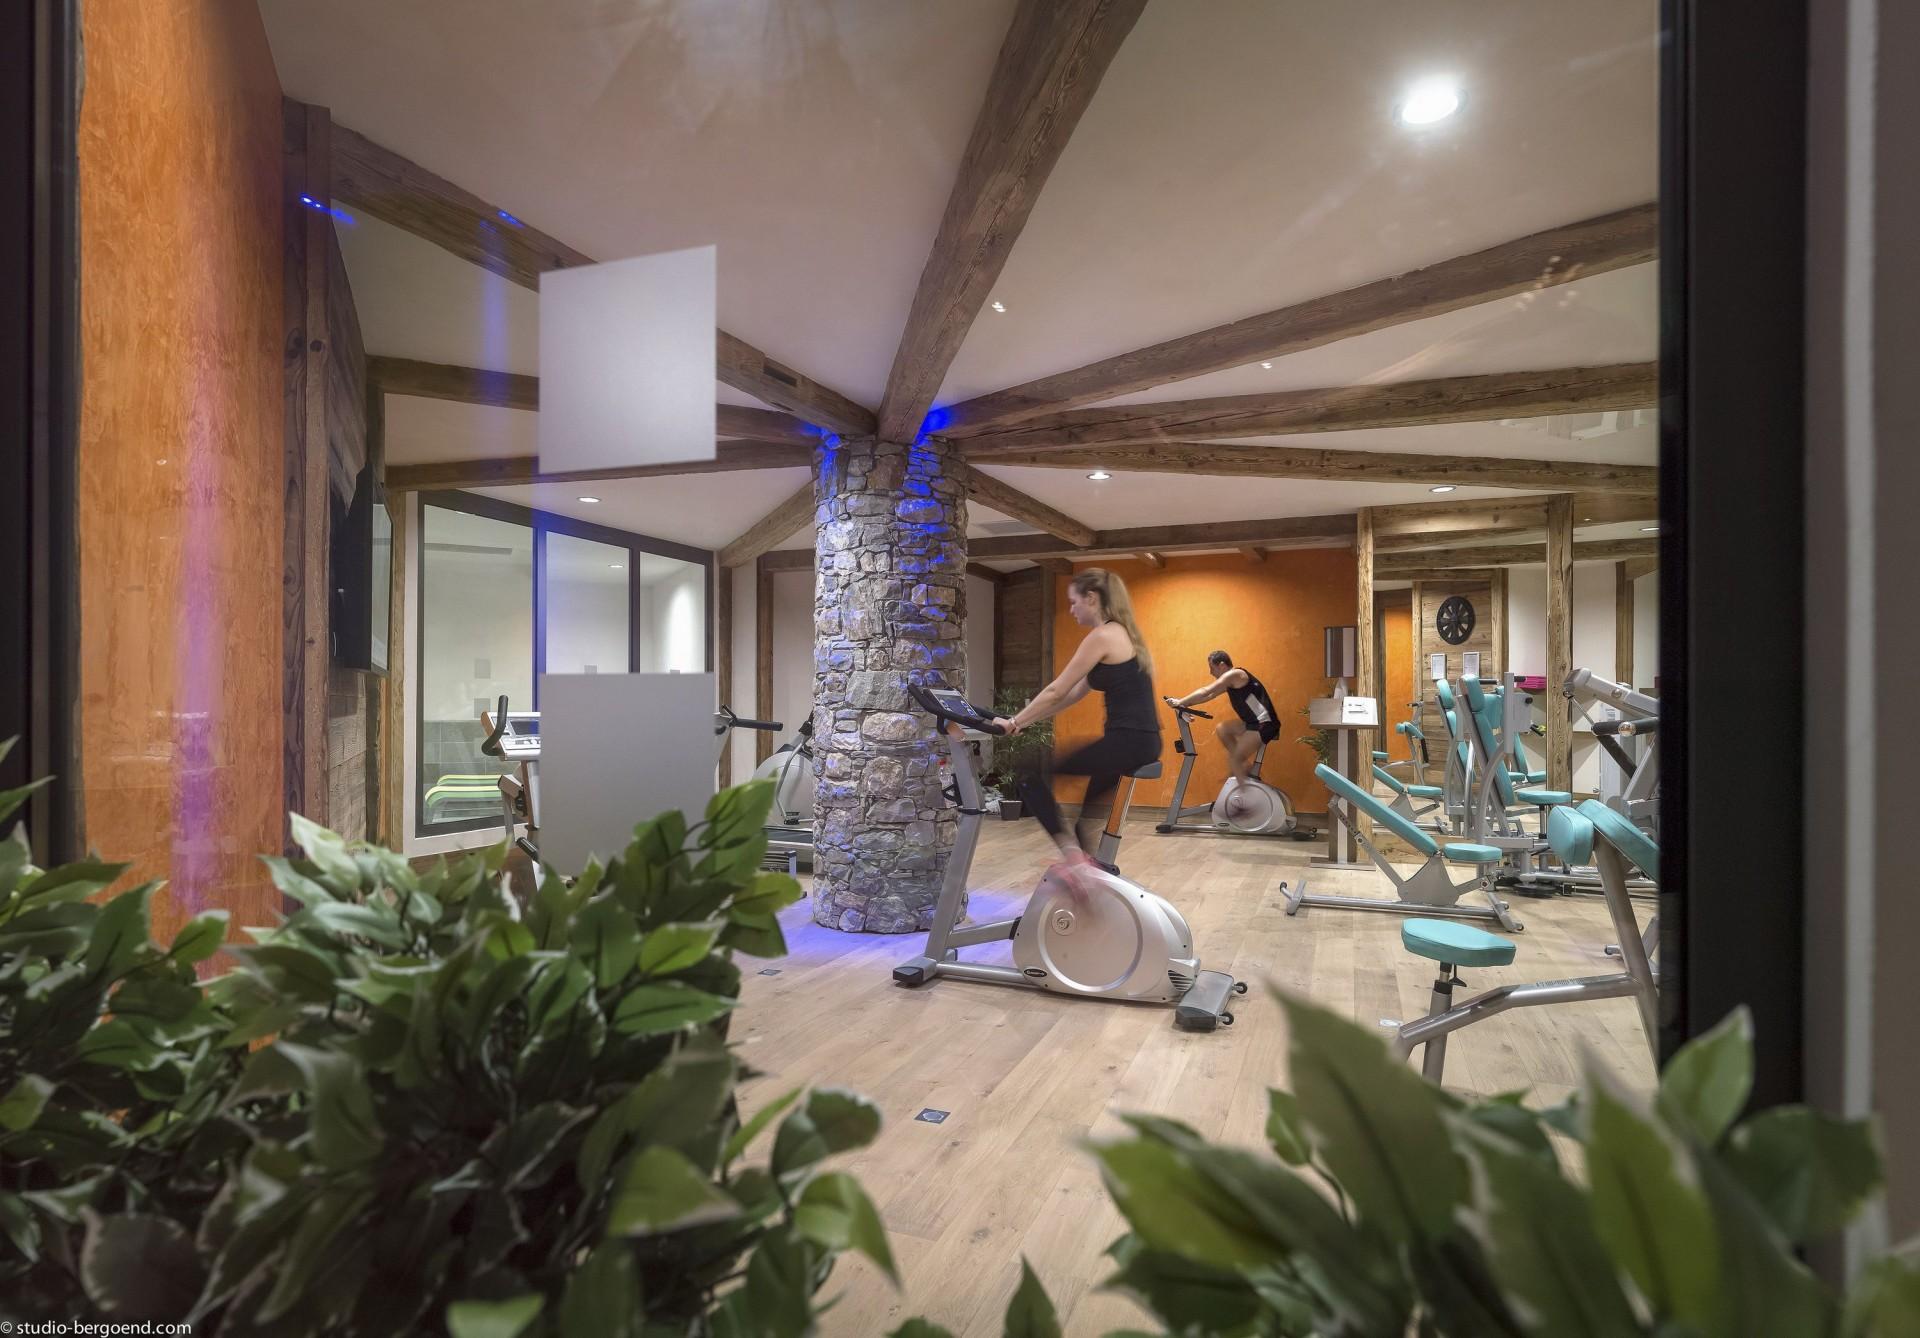 Tignes Location Appartement Luxe Micate Salle De Fitness